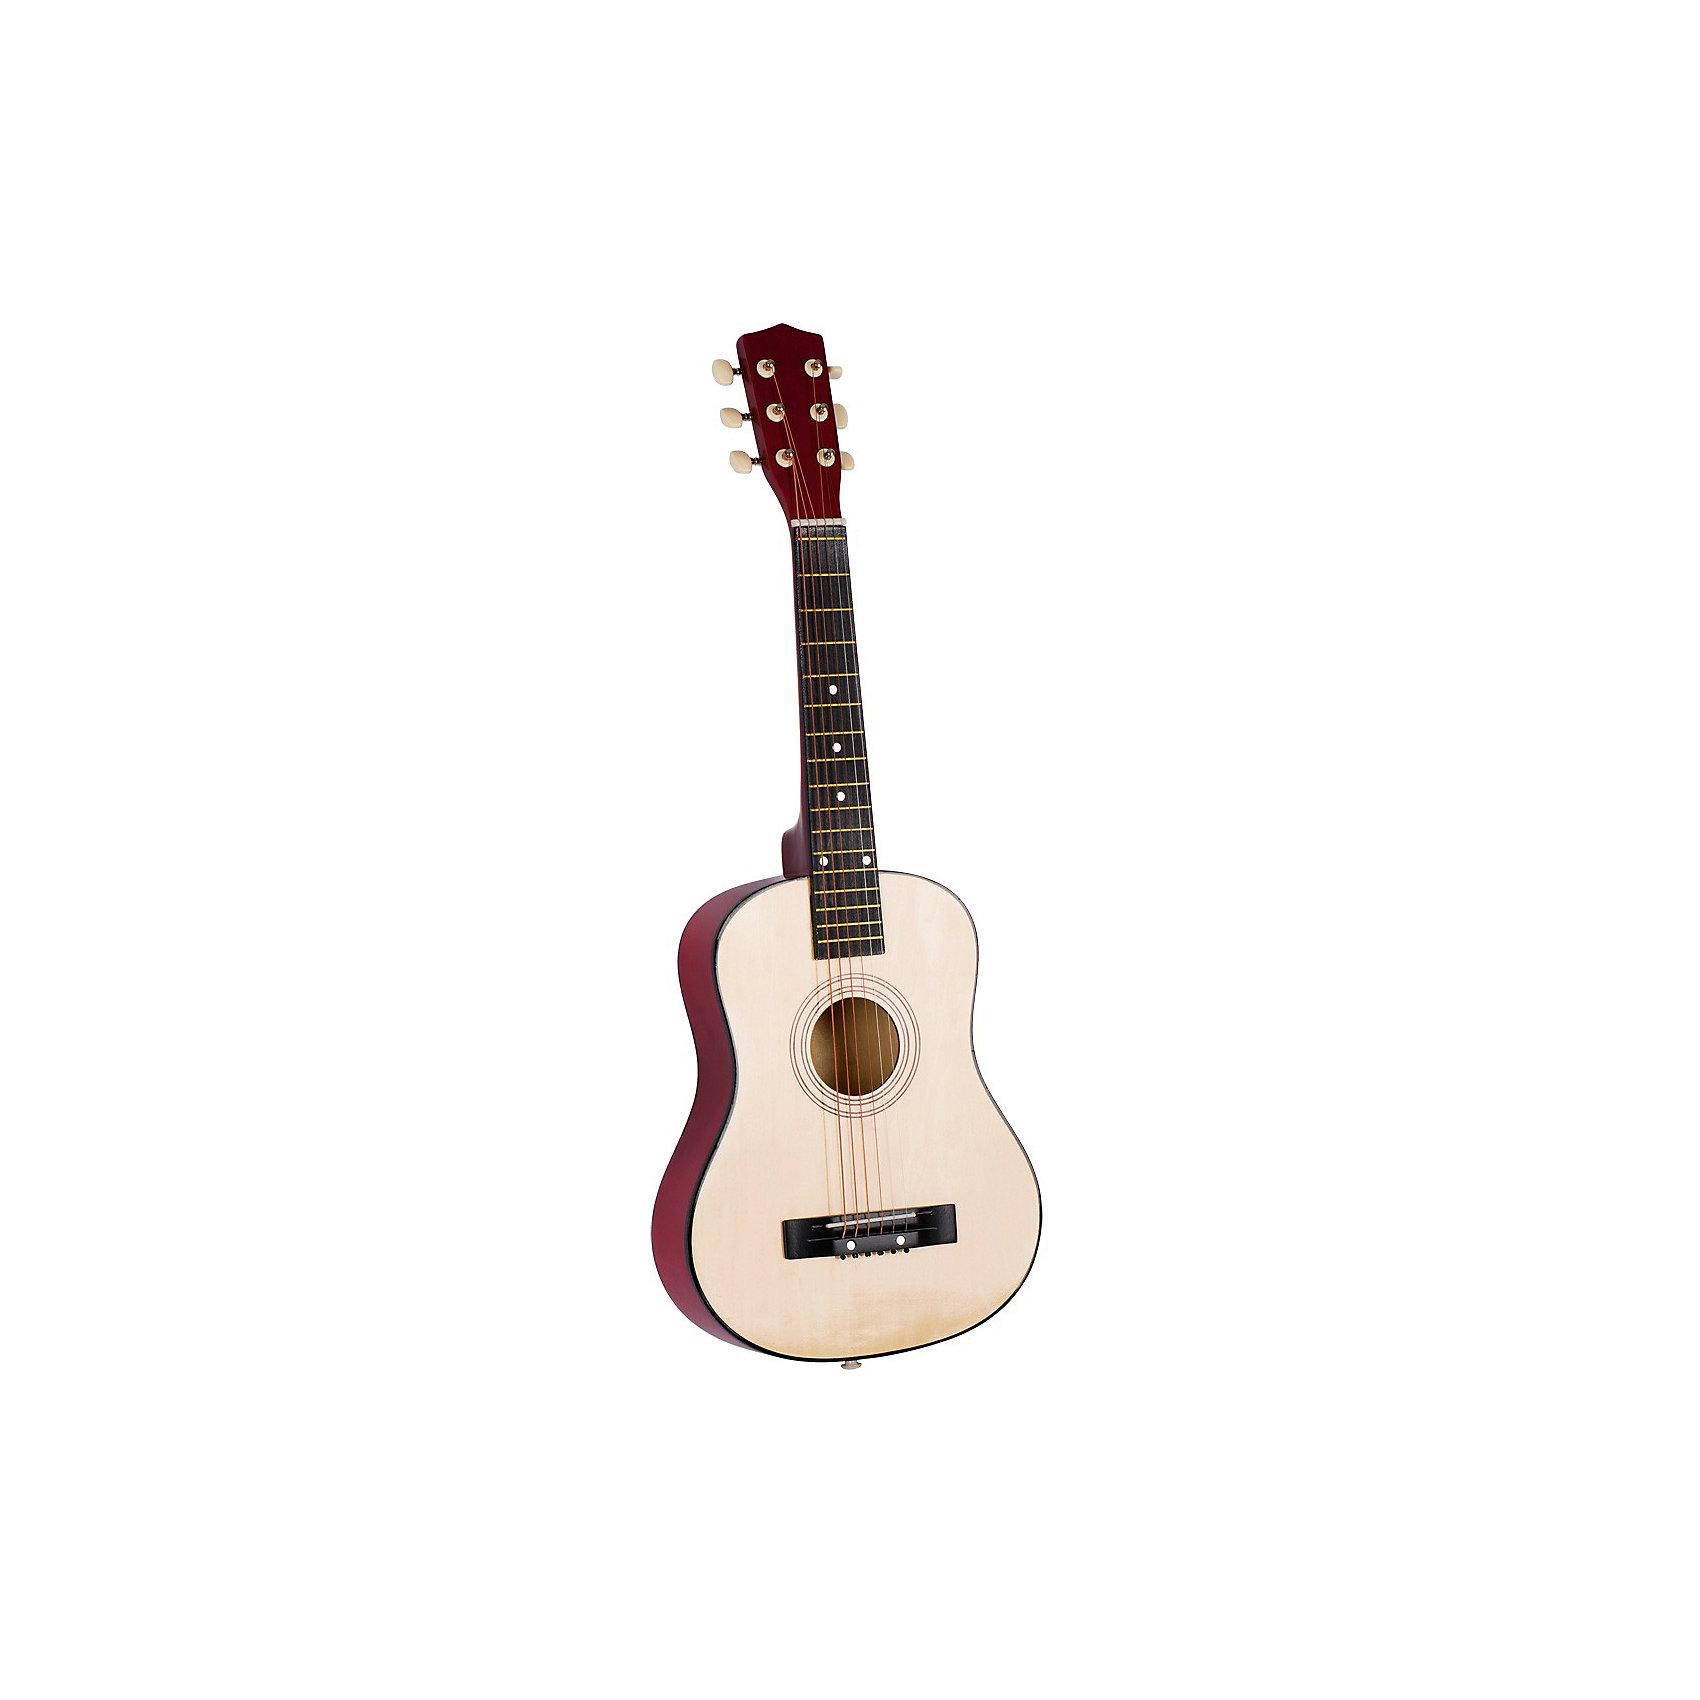 Гитара шестиструнная, 76 см., gokiШестиструнная гитара<br><br>Ширина мм: 760<br>Глубина мм: 120<br>Высота мм: 500<br>Вес г: 1265<br>Возраст от месяцев: 72<br>Возраст до месяцев: 144<br>Пол: Унисекс<br>Возраст: Детский<br>SKU: 4328617